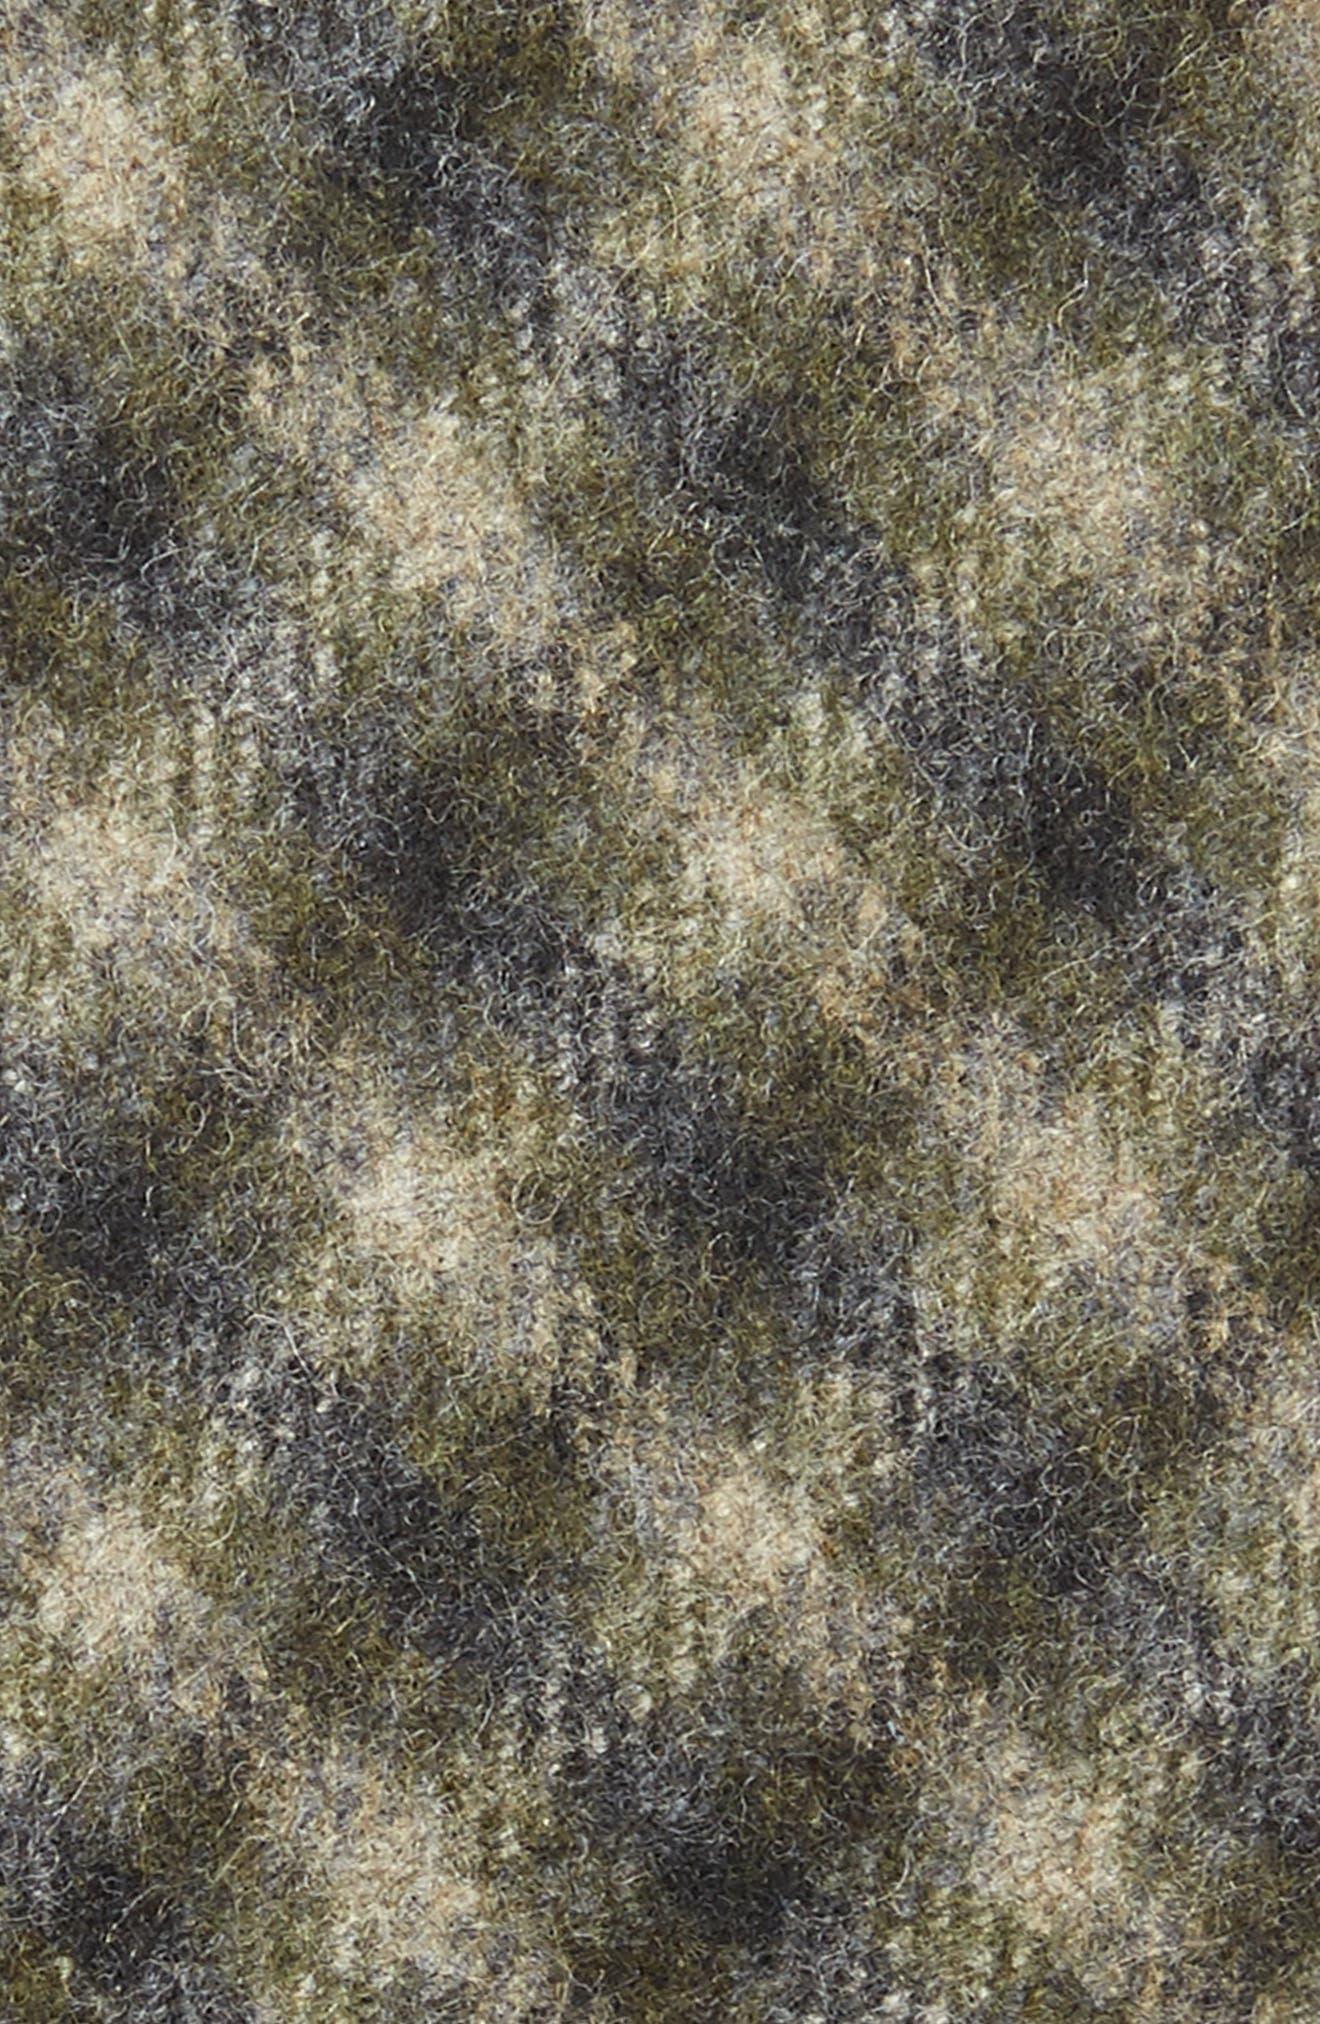 Glencheck Wool Skinny Tie,                             Alternate thumbnail 2, color,                             343